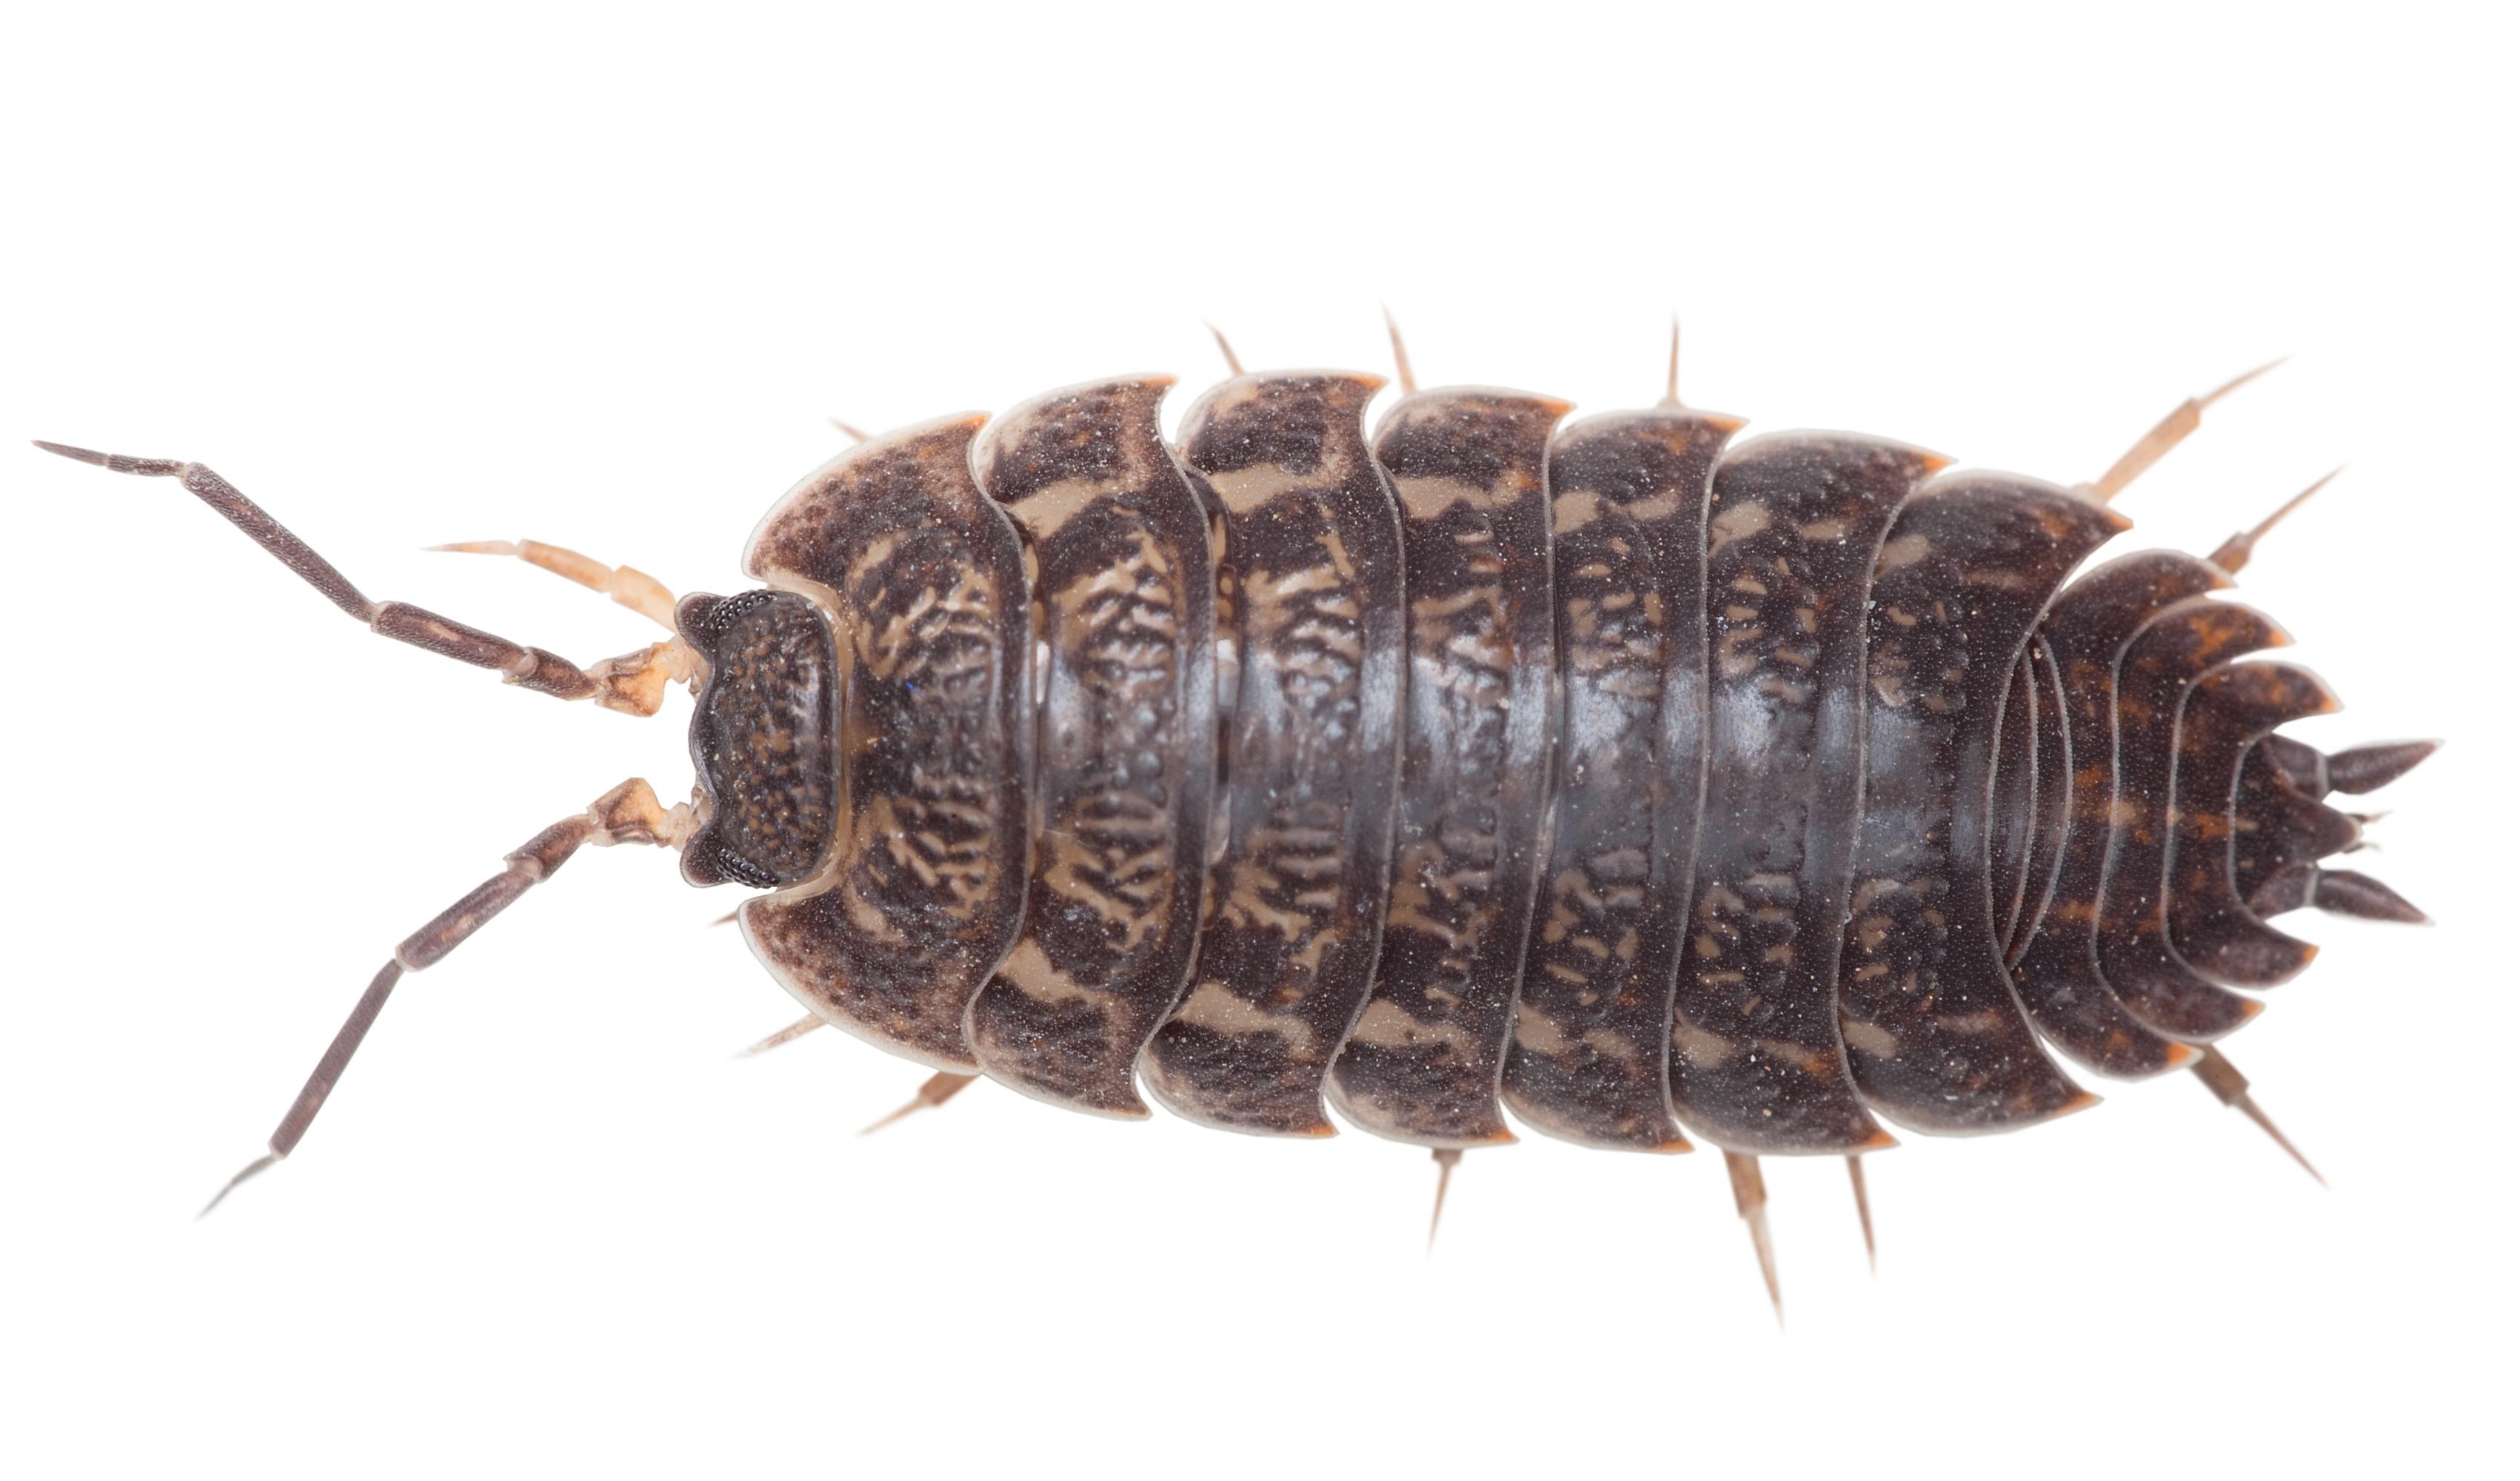 Bænkebider (Oniscidea)